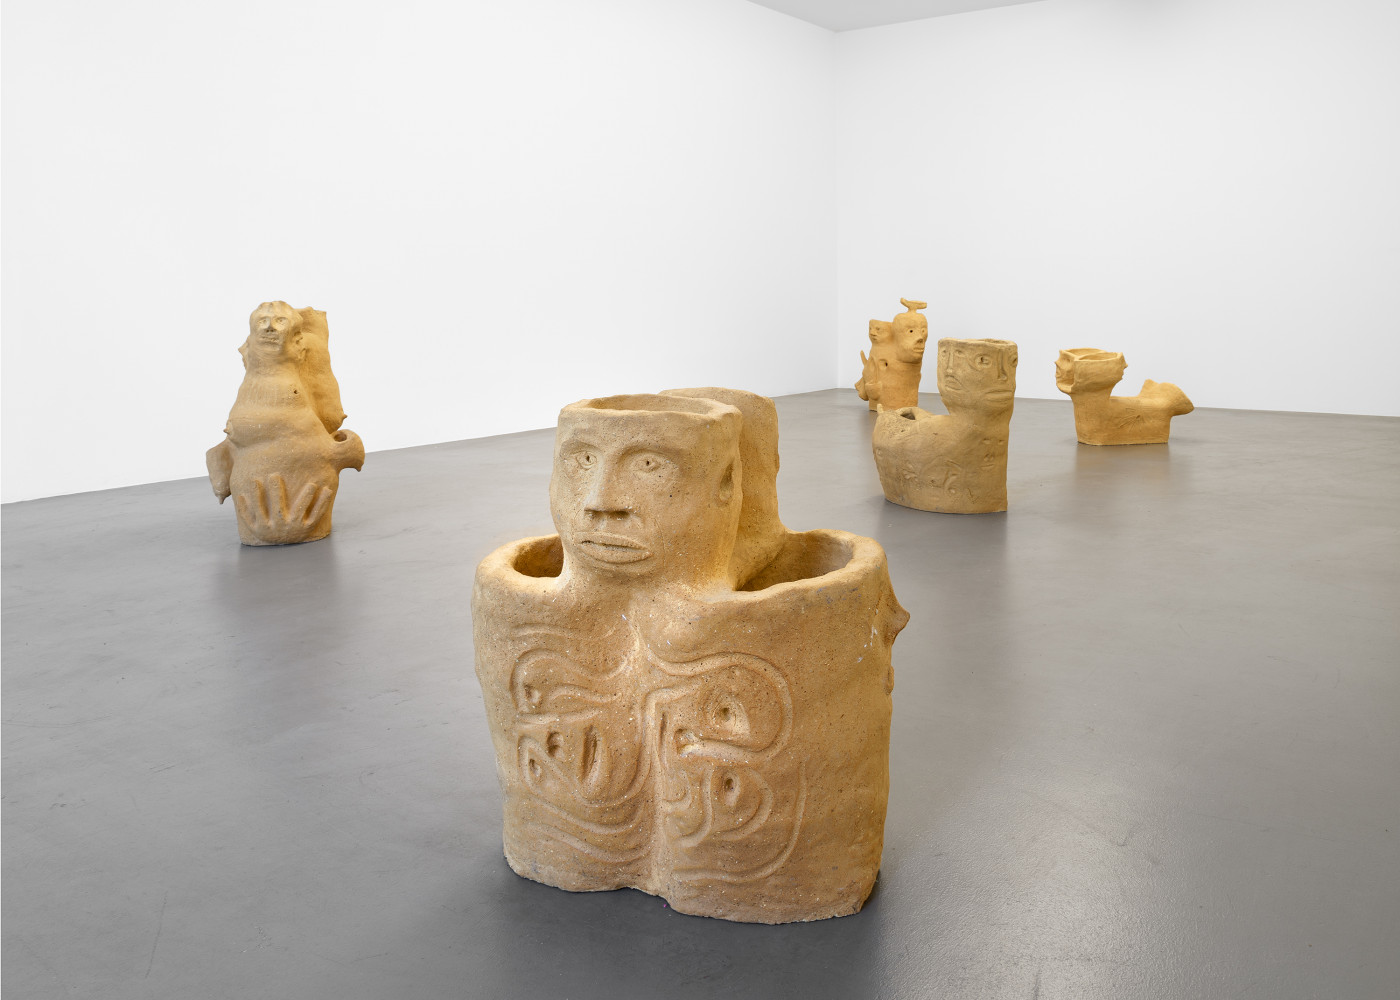 Martin Disler, Installation view, Buchmann Box, 2016